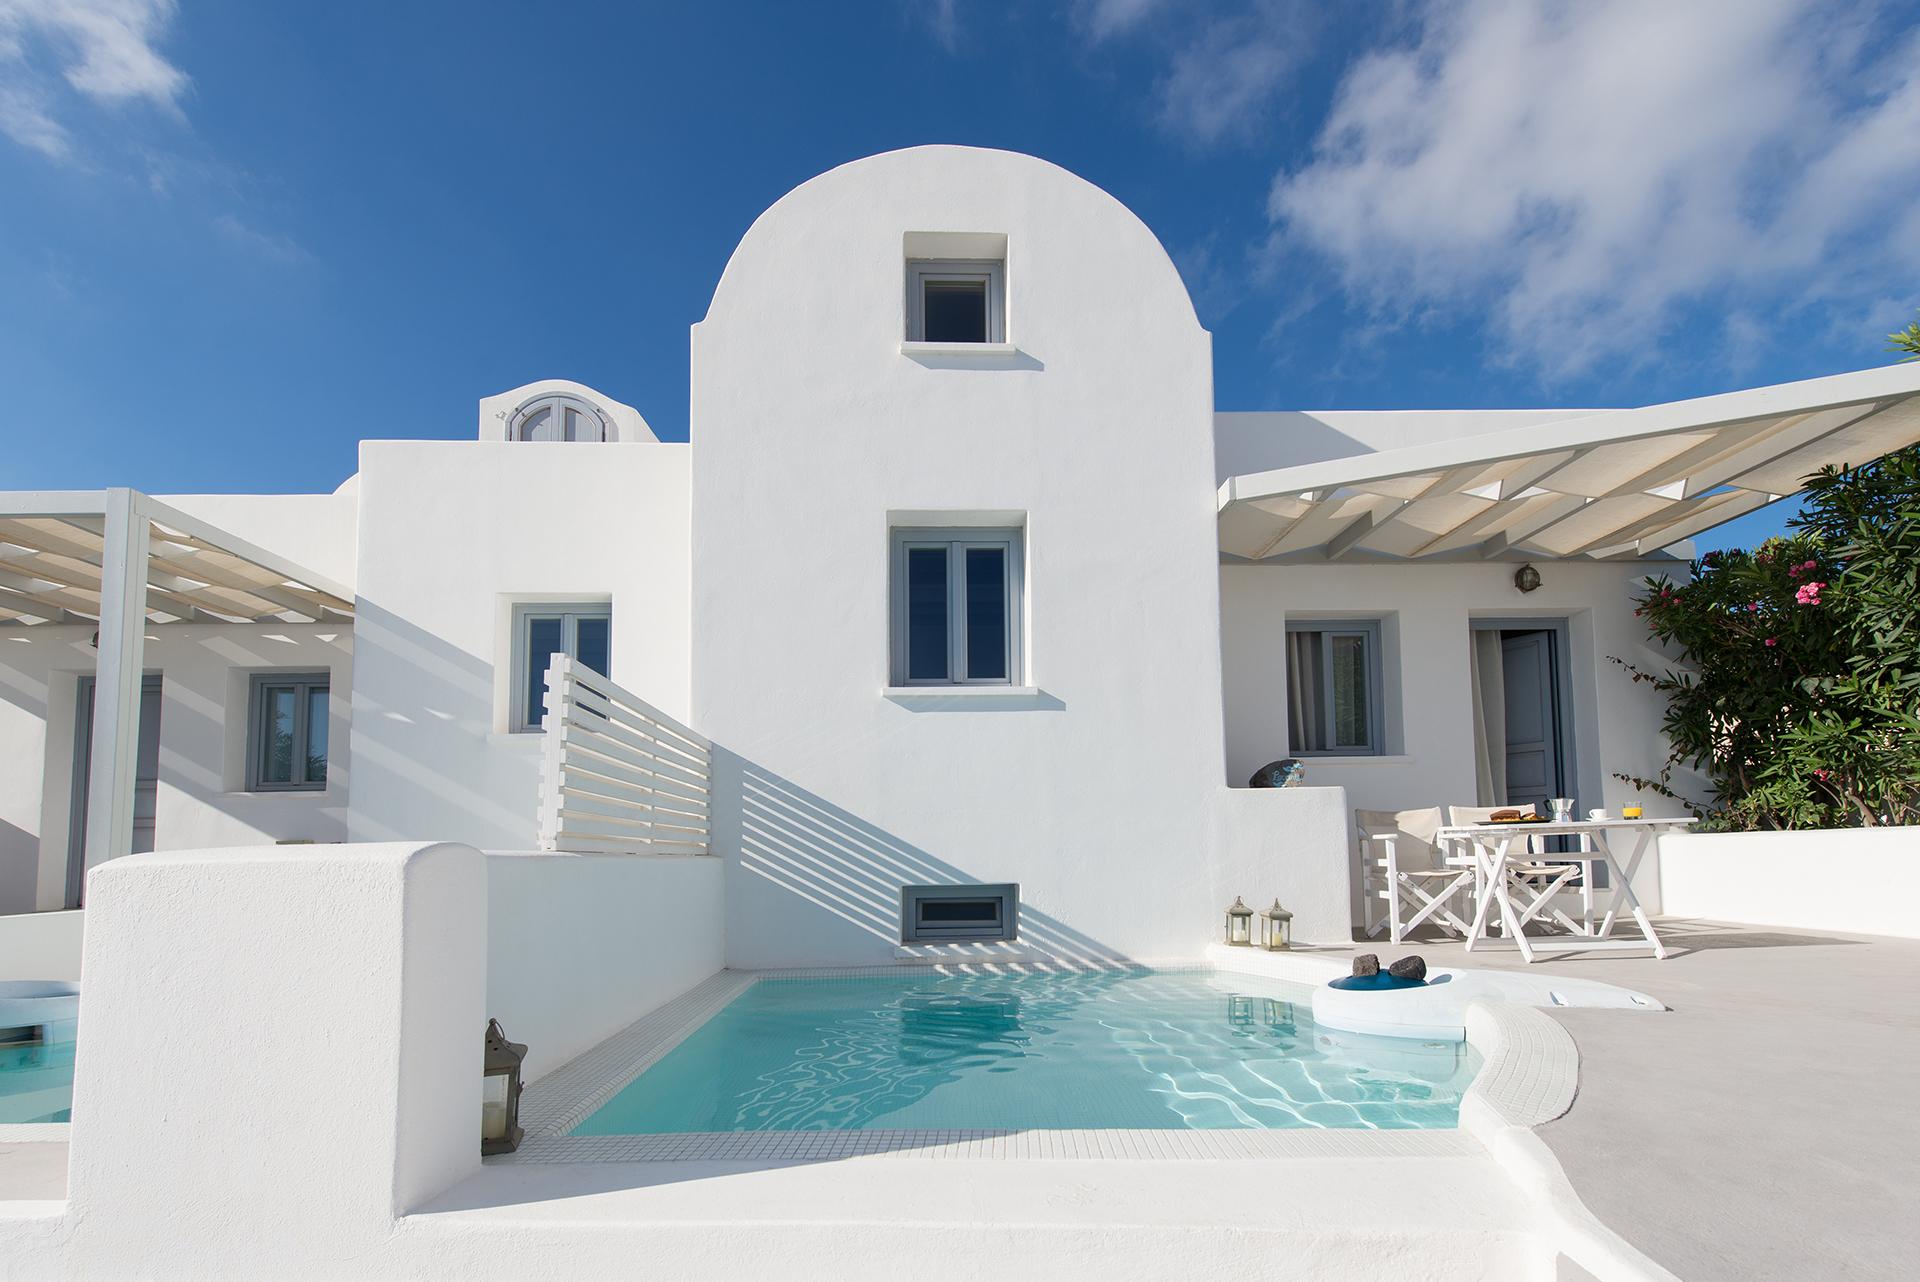 Aura Marina Apartments in Santorini www.aura-marina.com